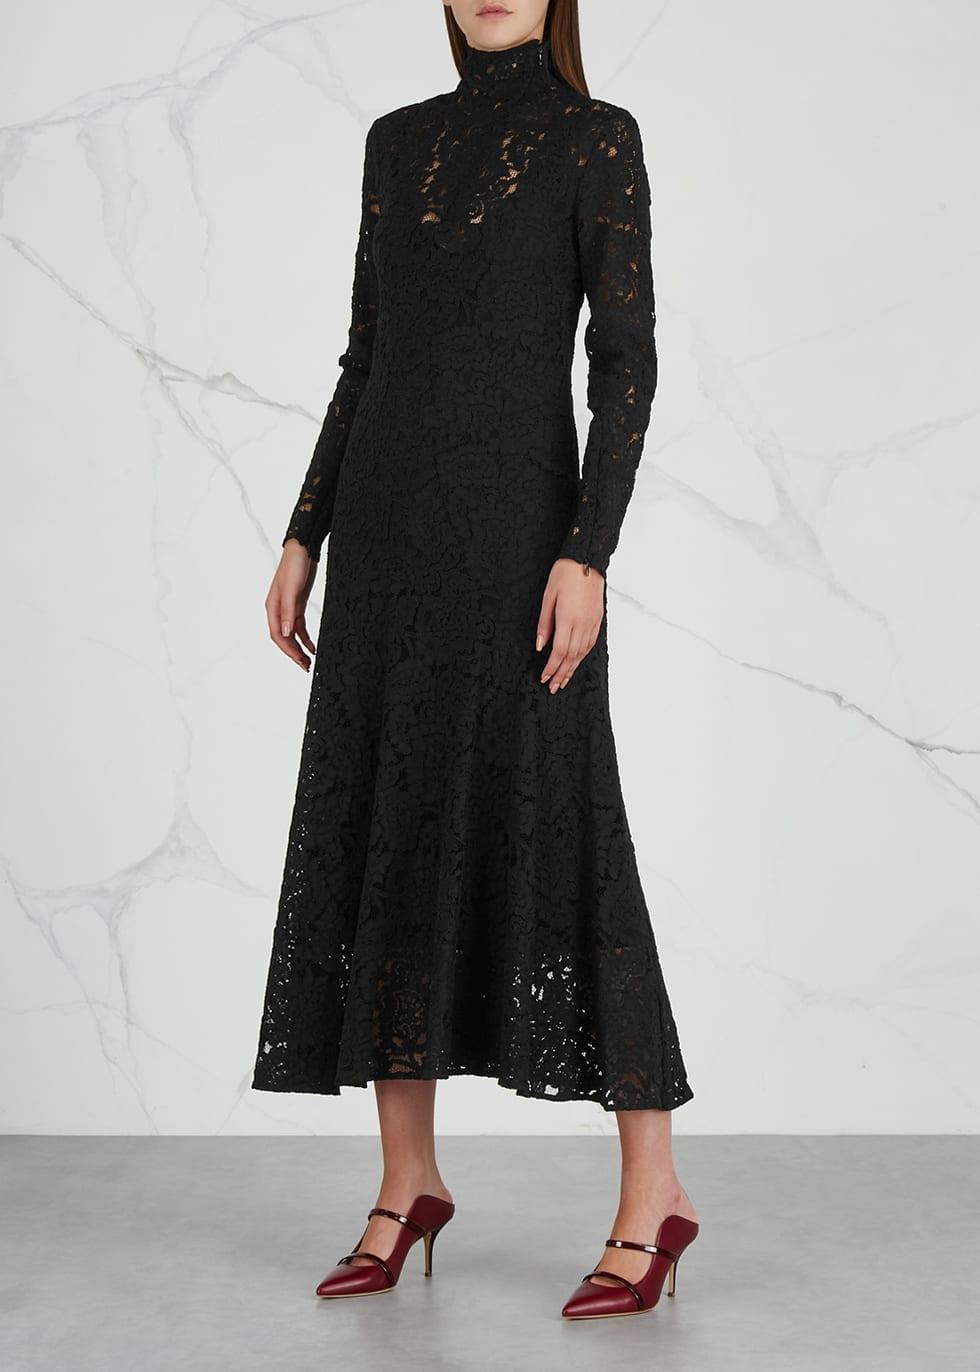 By Malene Birger Mulari Lace Midi Black Dress 2